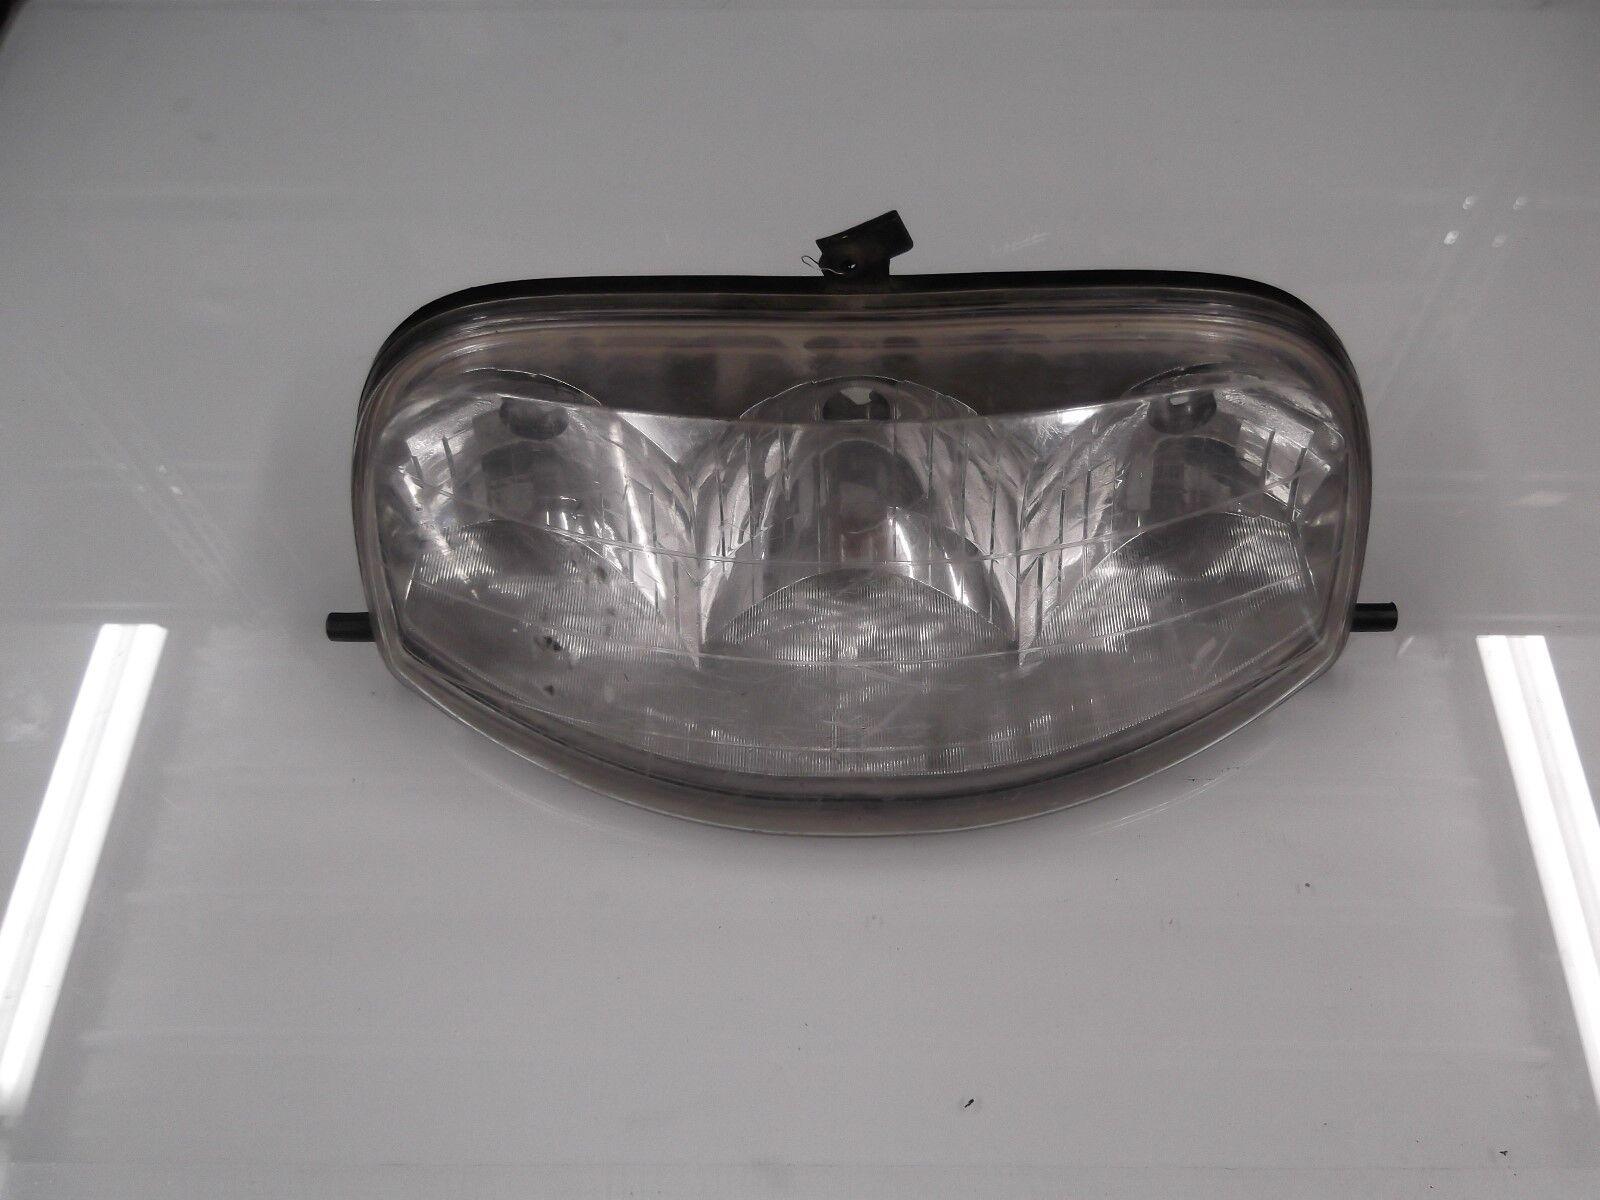 2006 Arctic Cat Z 440 Headlight